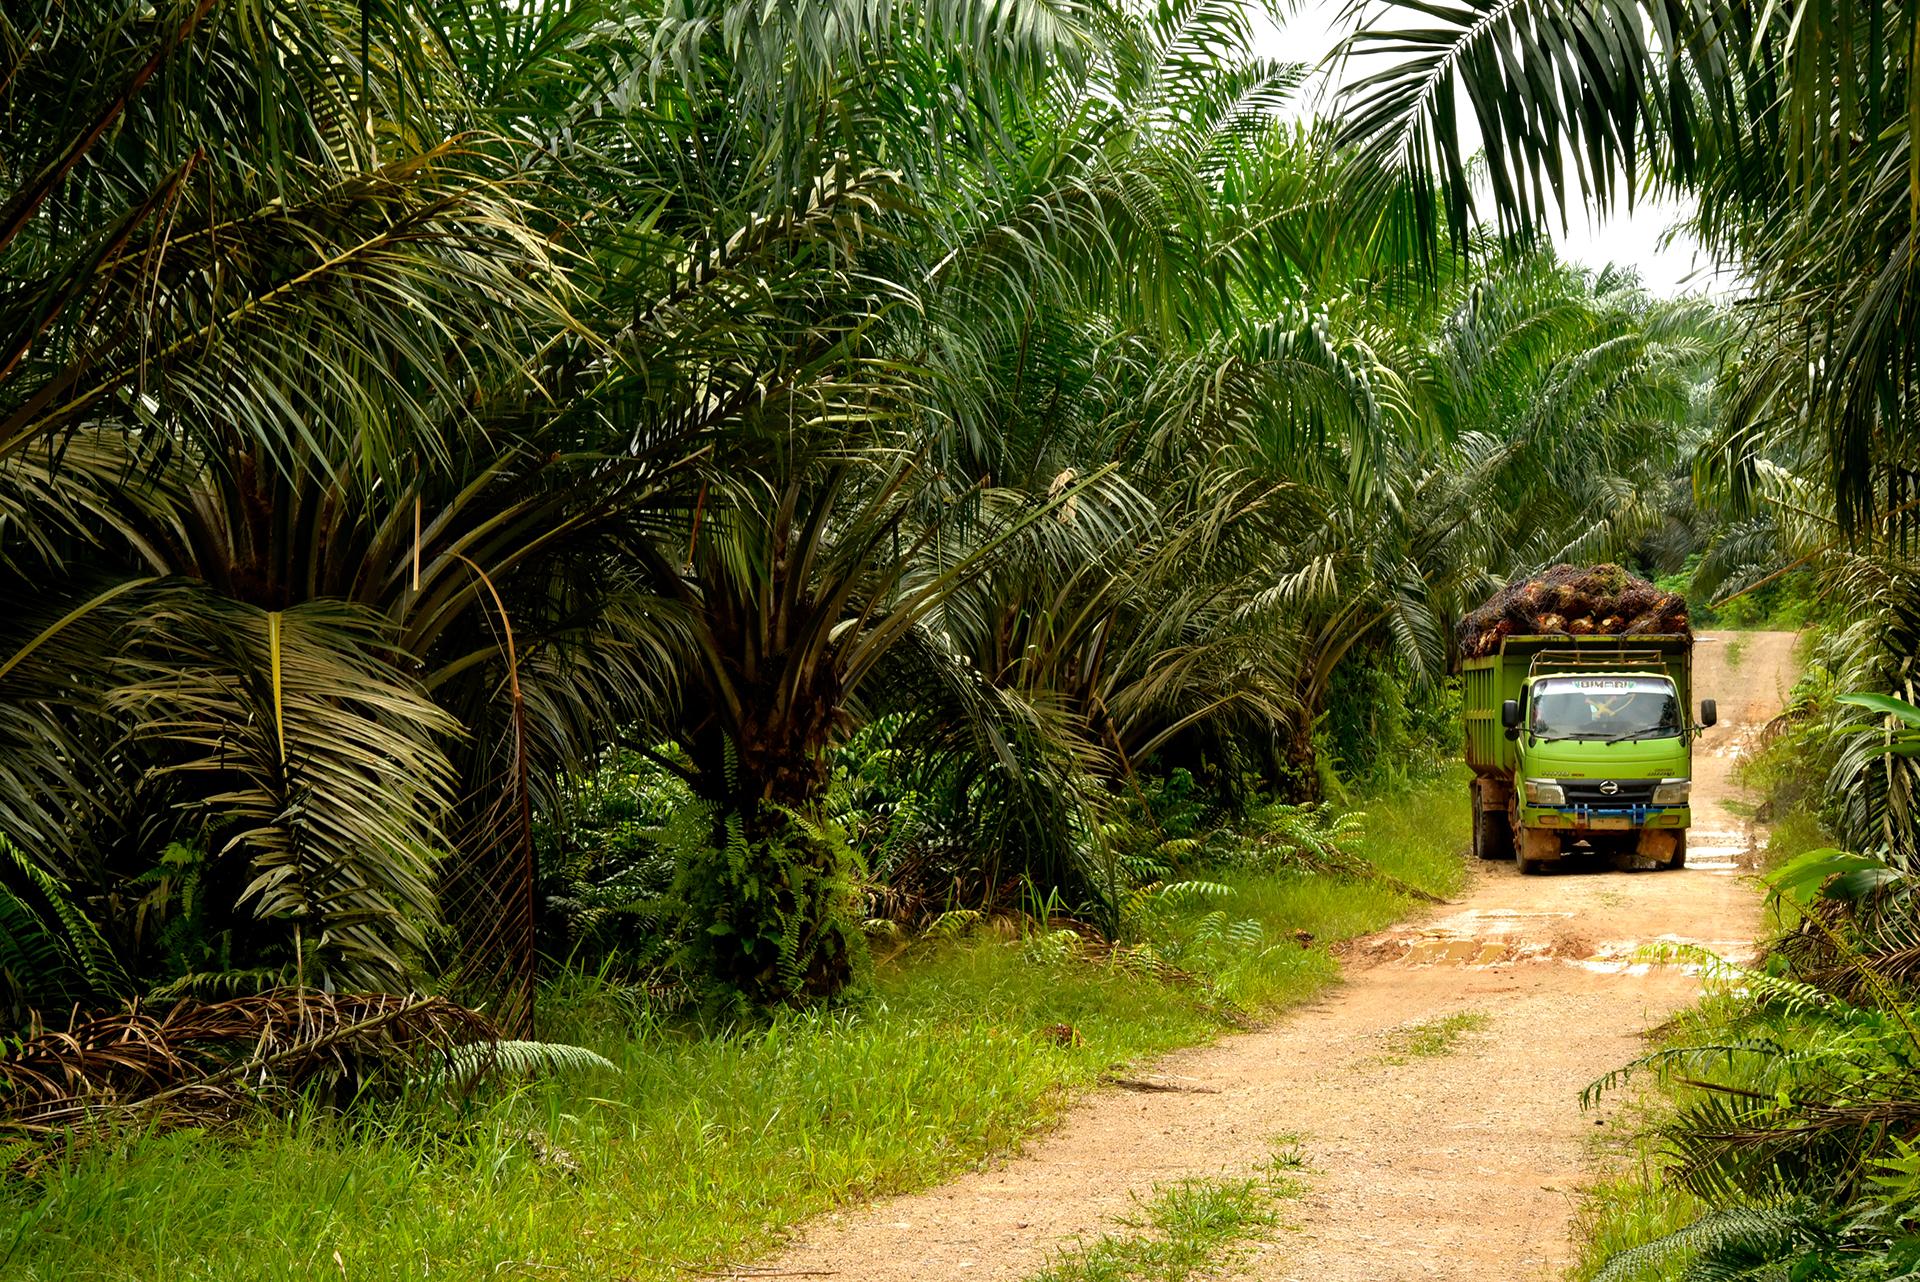 Oil Palm work